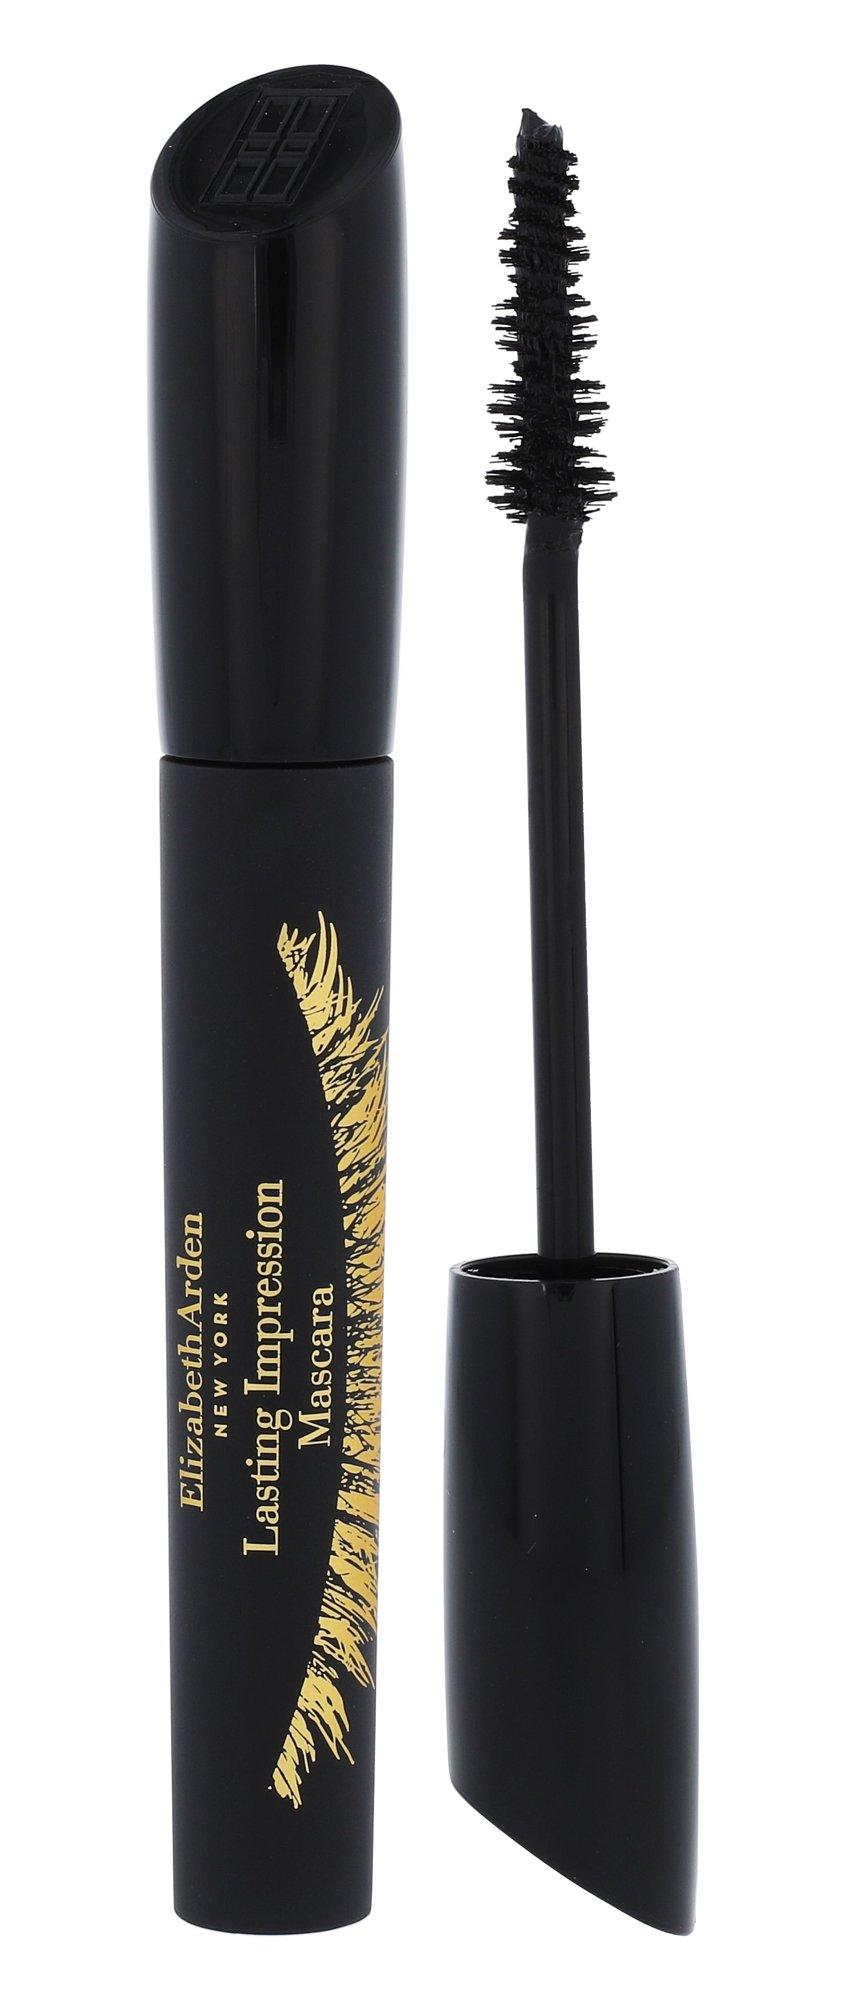 Elizabeth Arden Lasting Impression Cosmetic 8,5ml 01 Lasting Black